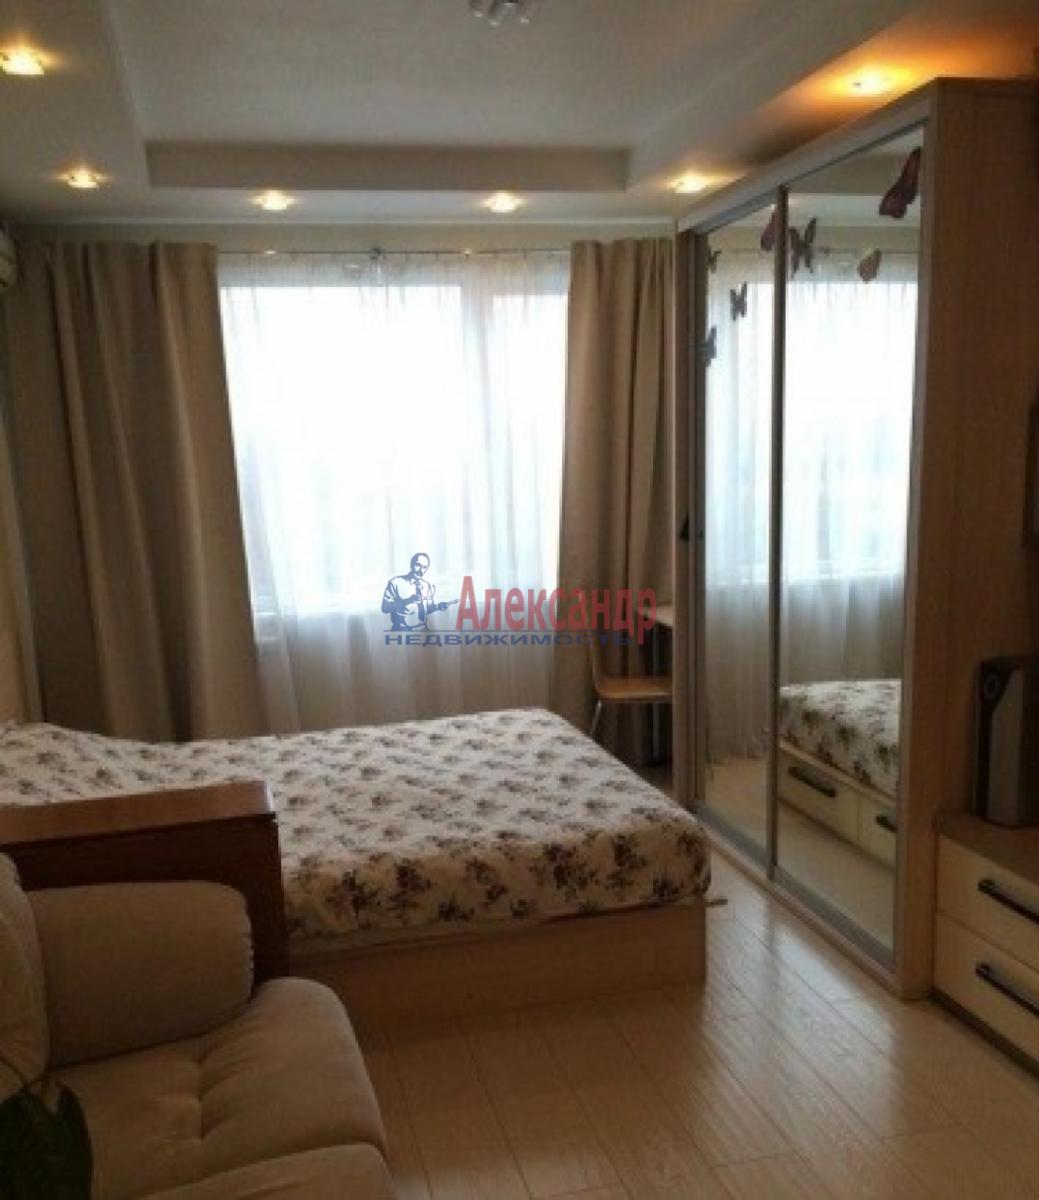 2-комнатная квартира (50м2) в аренду по адресу Ленинский пр., 176— фото 4 из 9